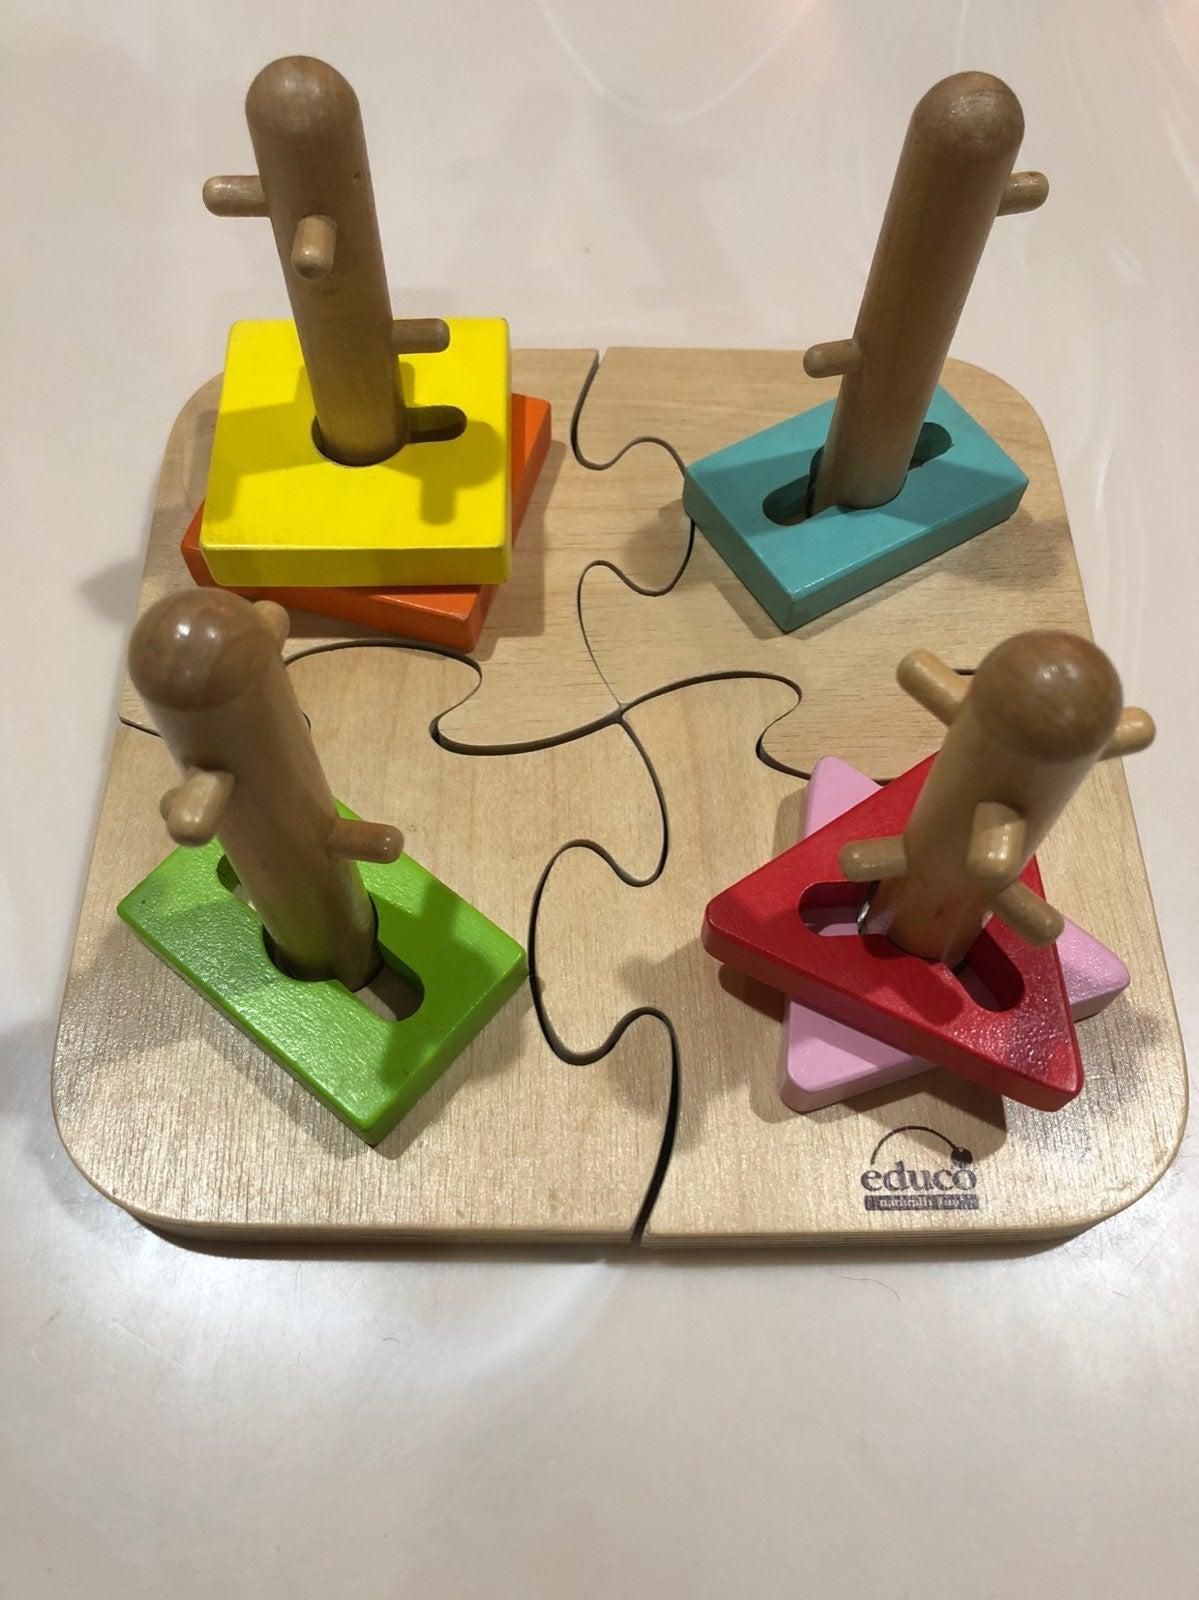 montessori type toy